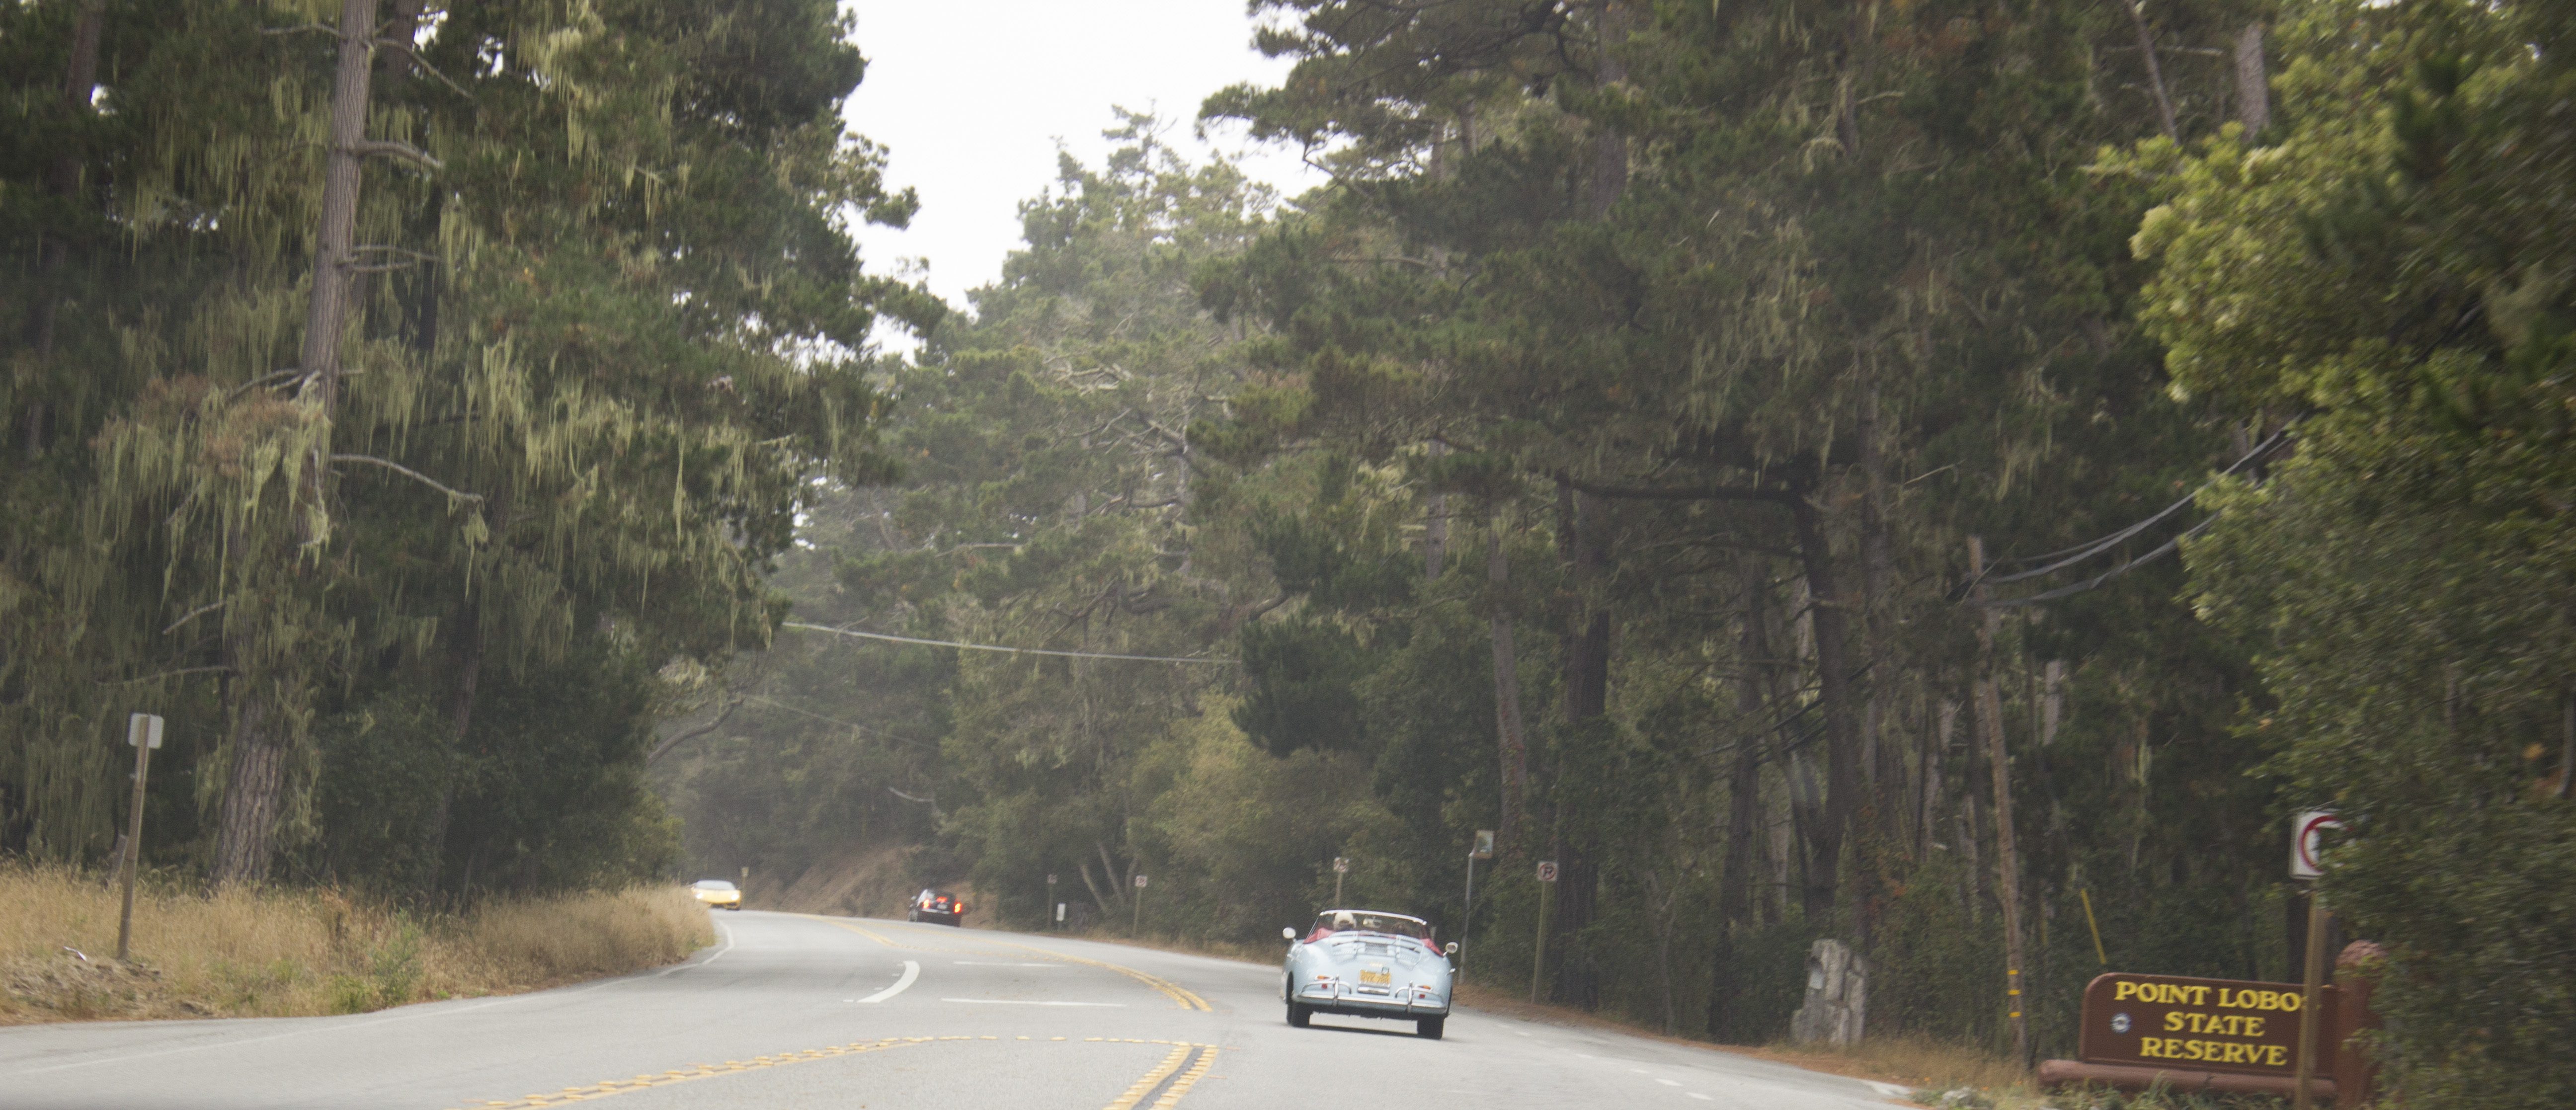 1_road35